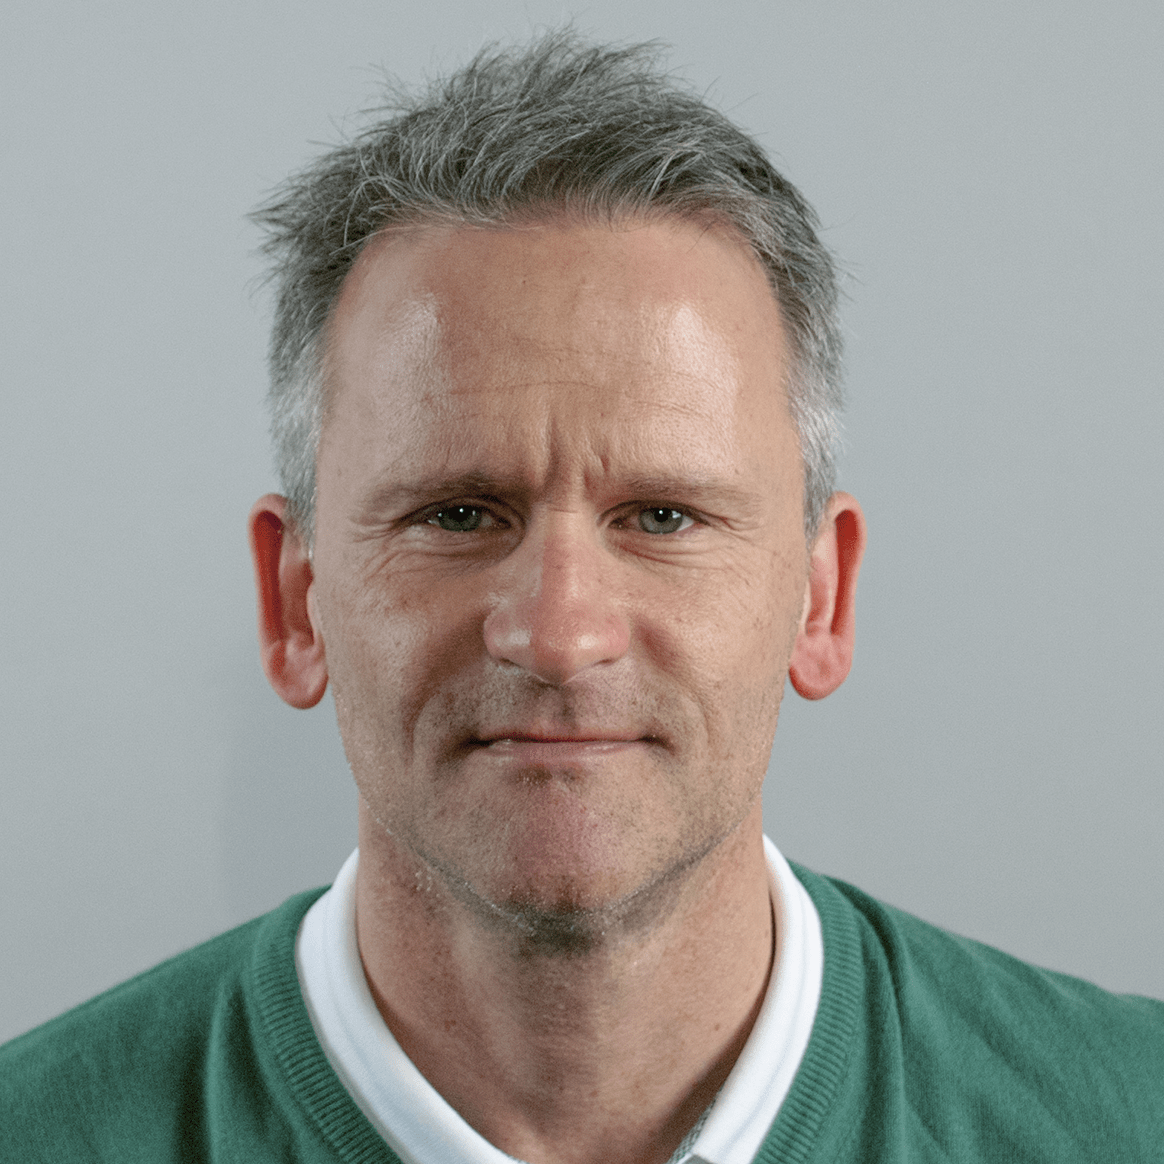 Portrait of Tenured Penn State Department of Architecture Associate Professor James Cooper